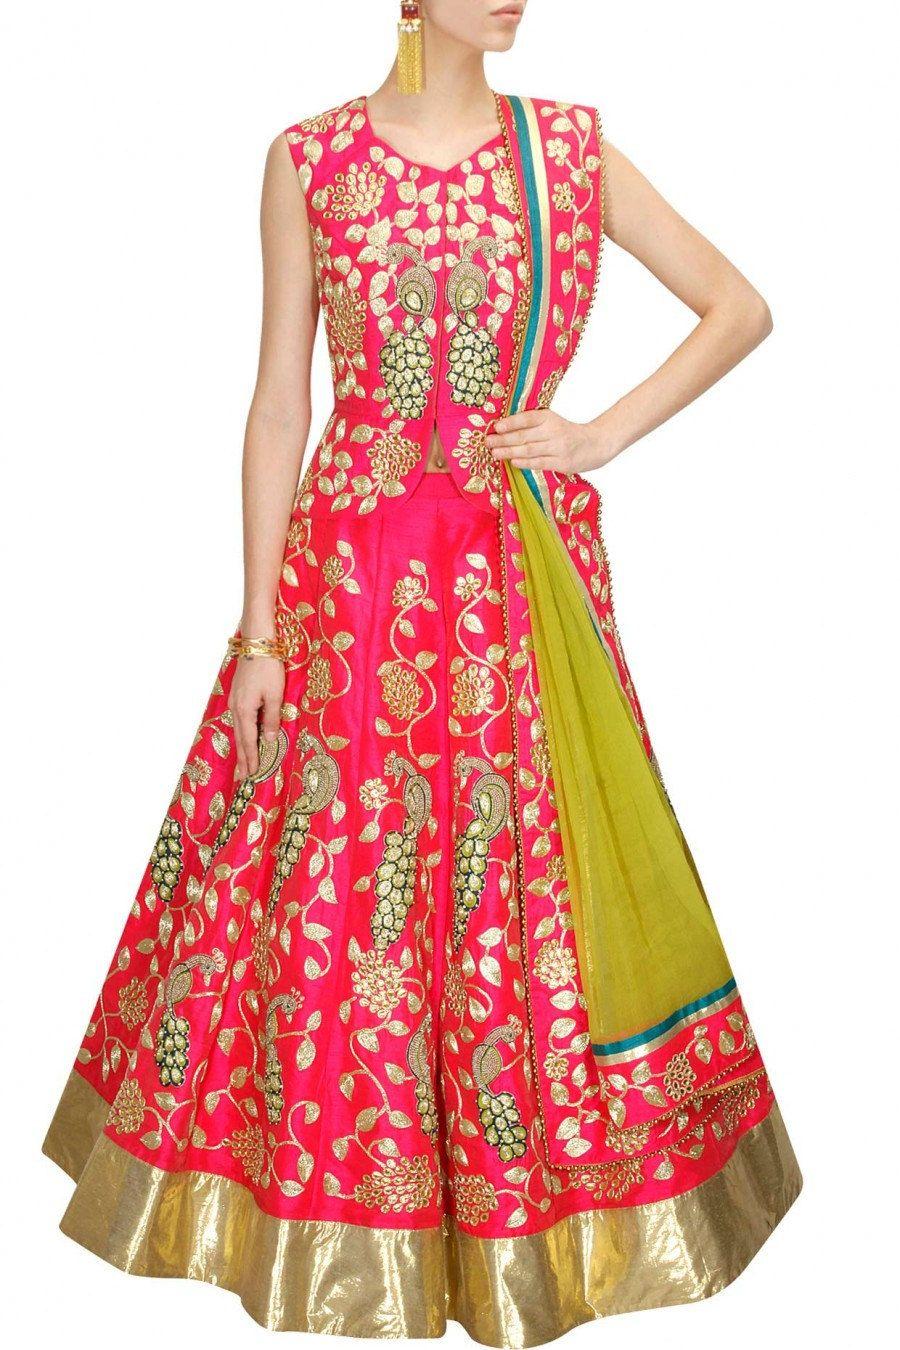 69310c2642f901 Rose Pink Colour Bridal Wedding Lehenga Choli by PanacheHauteCouture on Etsy